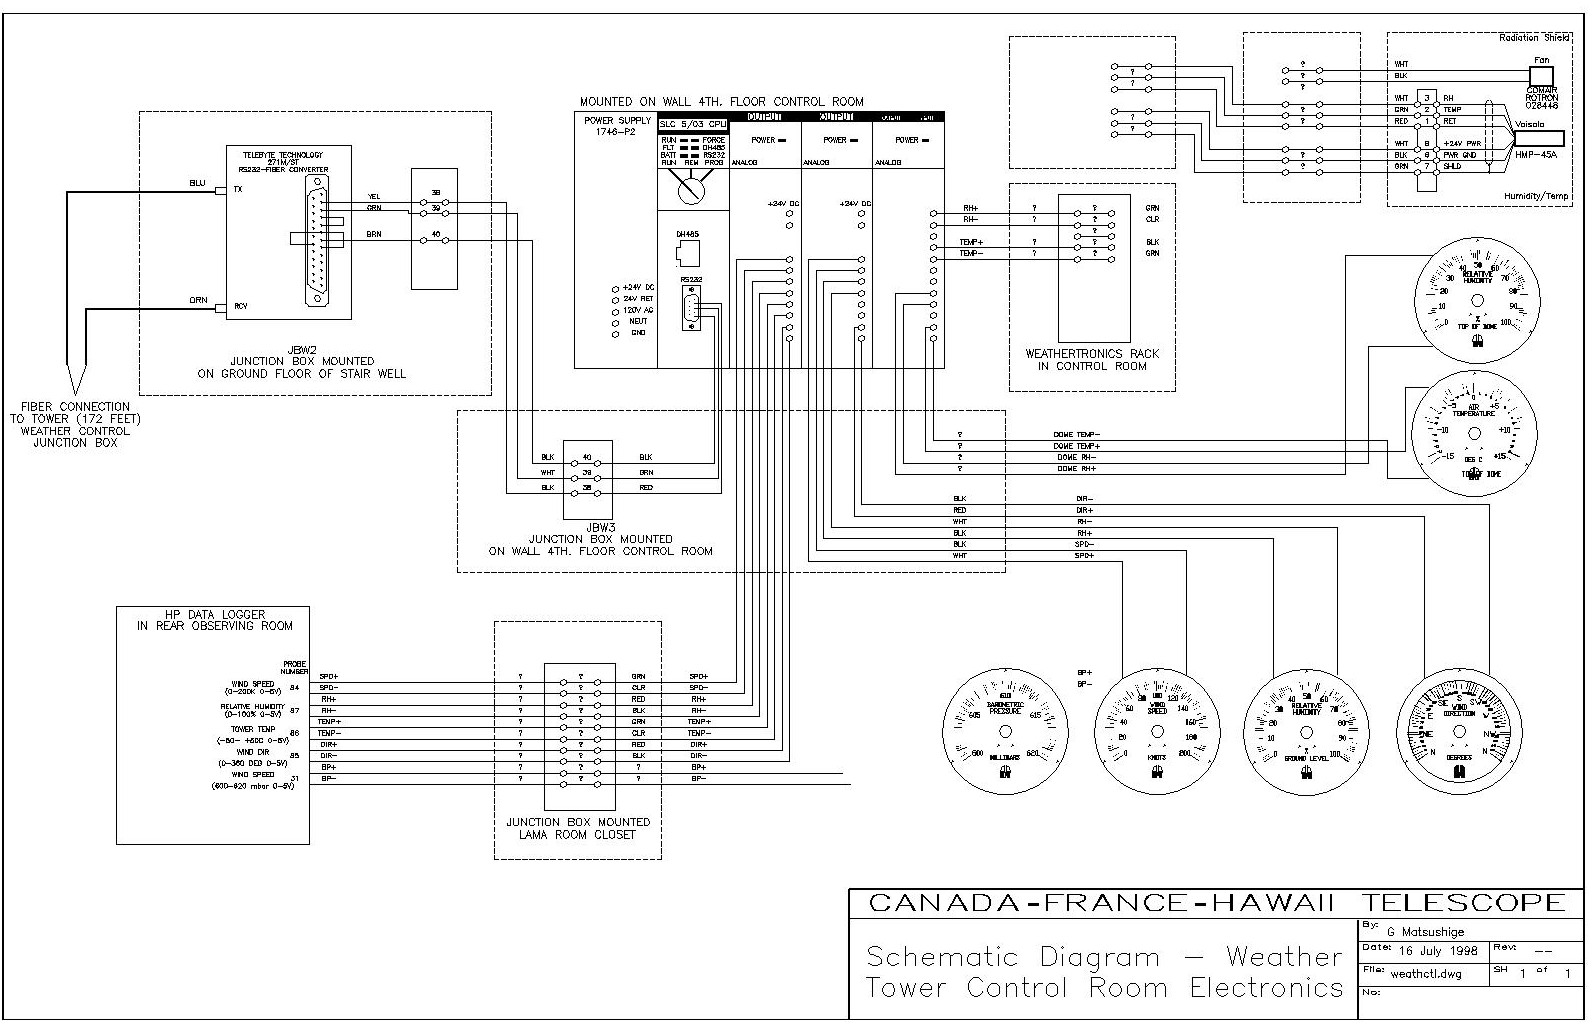 allen bradley relay wiring diagram cm 0773  diagram additionally plc schematic symbols also 5 pin  additionally plc schematic symbols